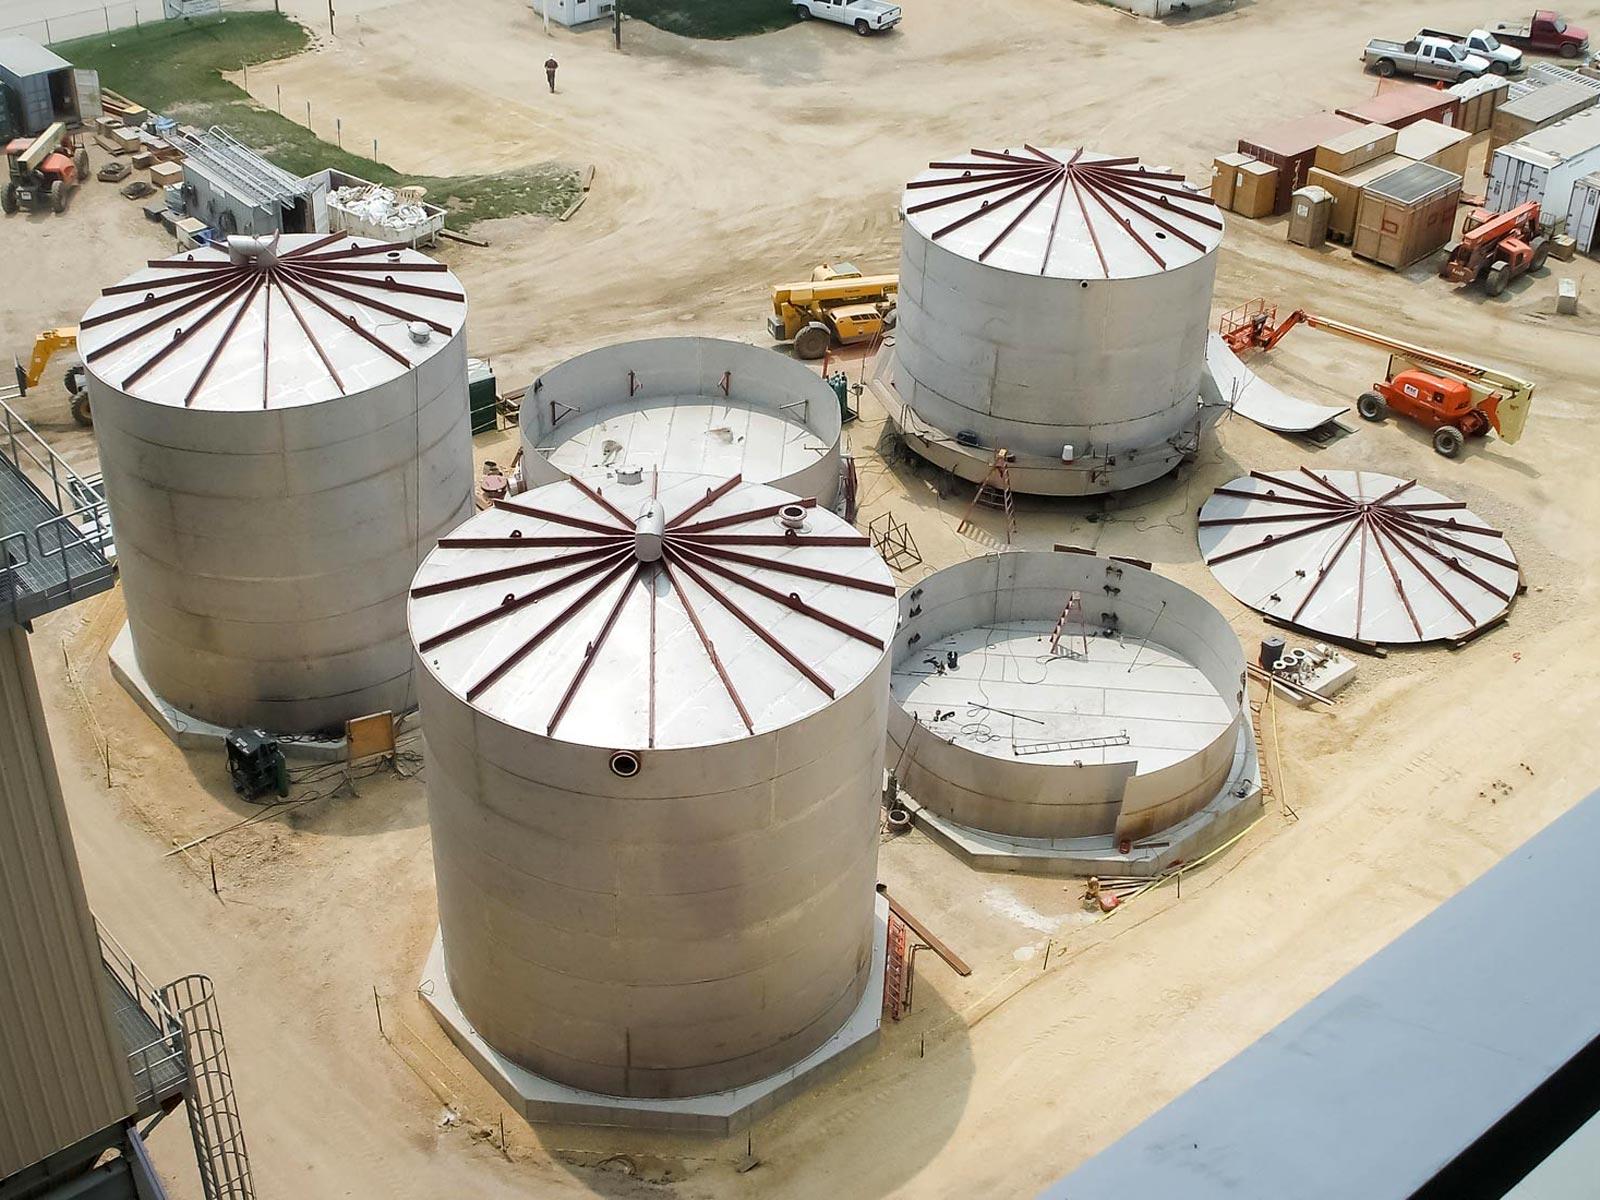 Tankage - Four Field Erected Stainless Steel De-Ionized Water TanksMORE →